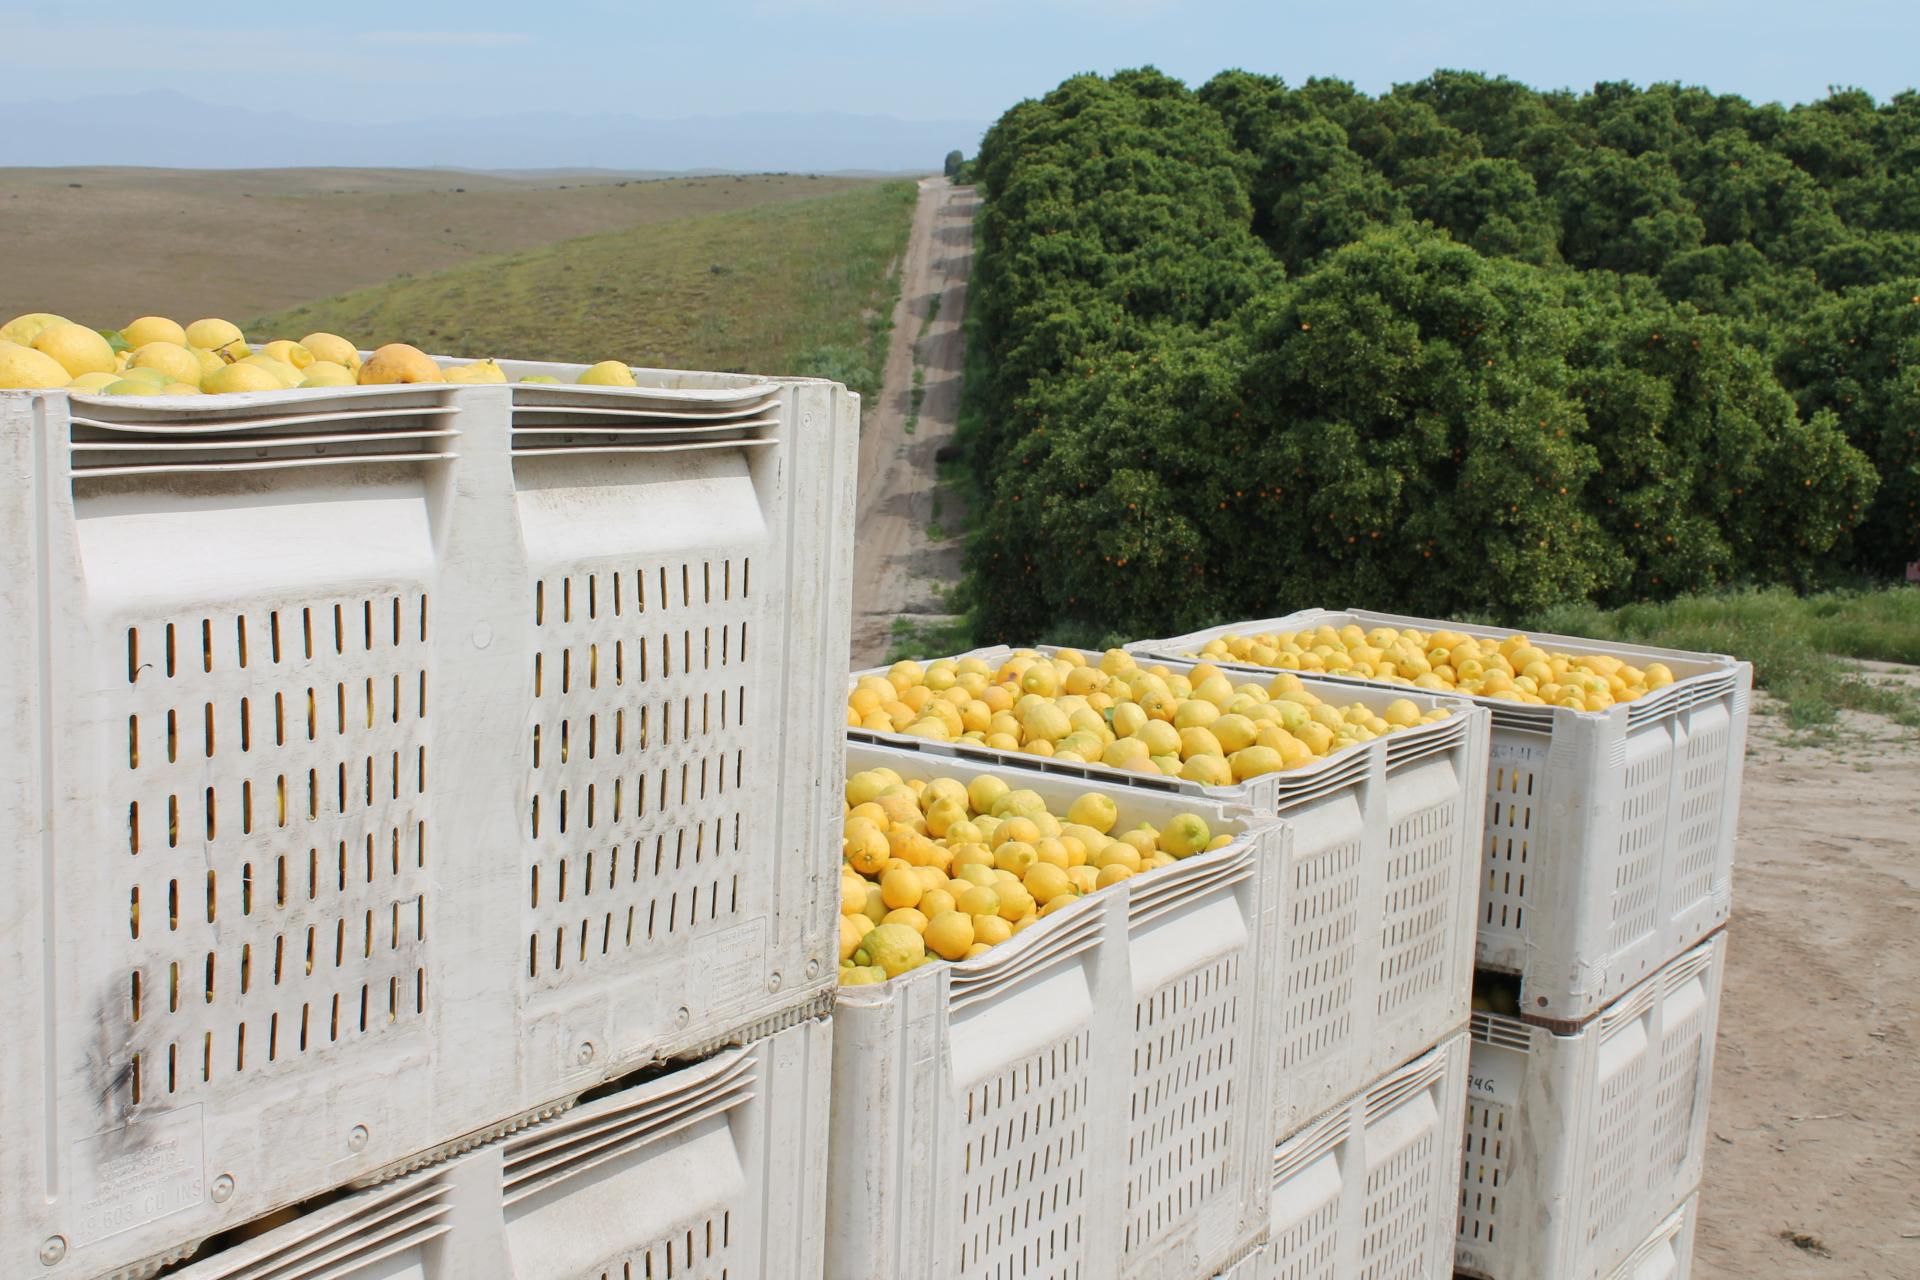 Response Letter Regarding Lemon Imports from Argentina